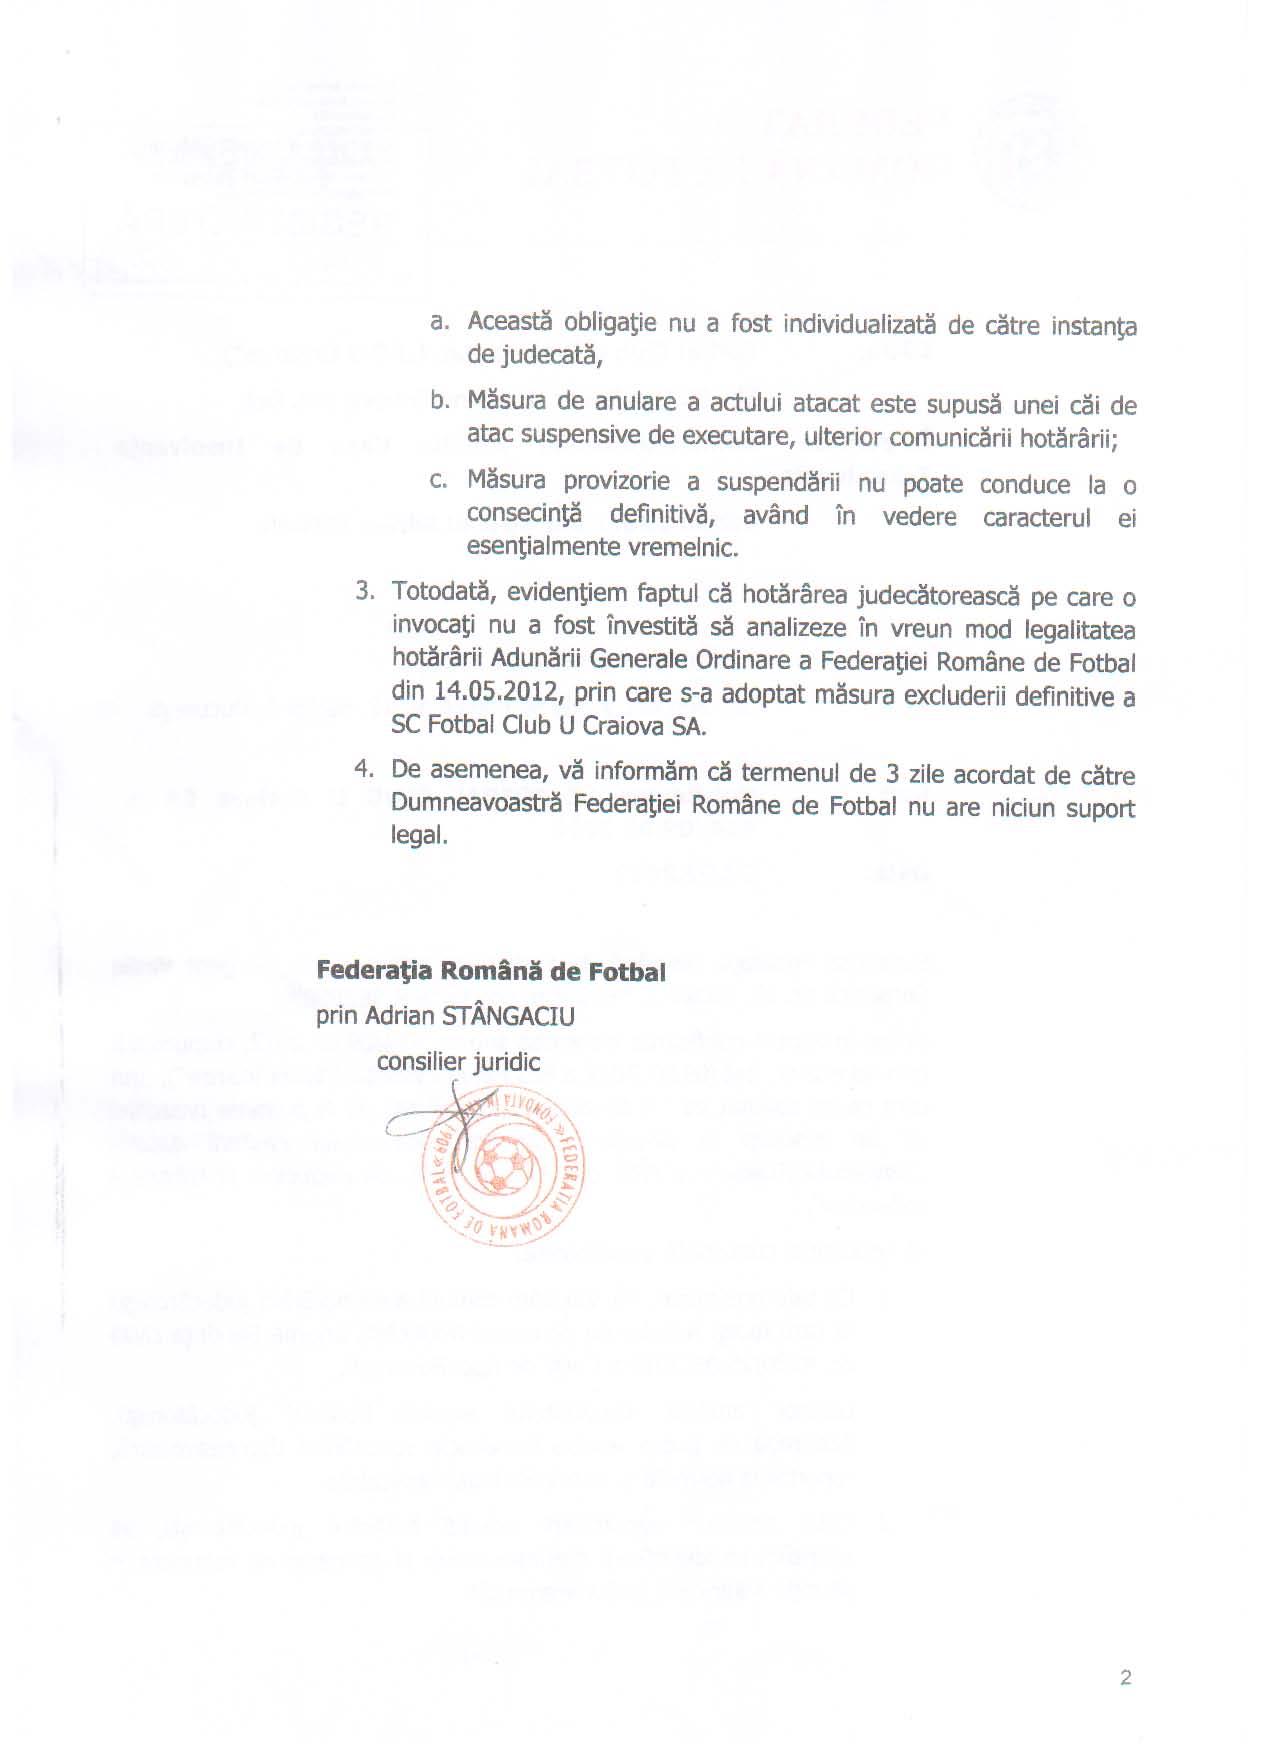 504591-pag-2-frf-raspuns-notificare-13-iulie-2012.jpg